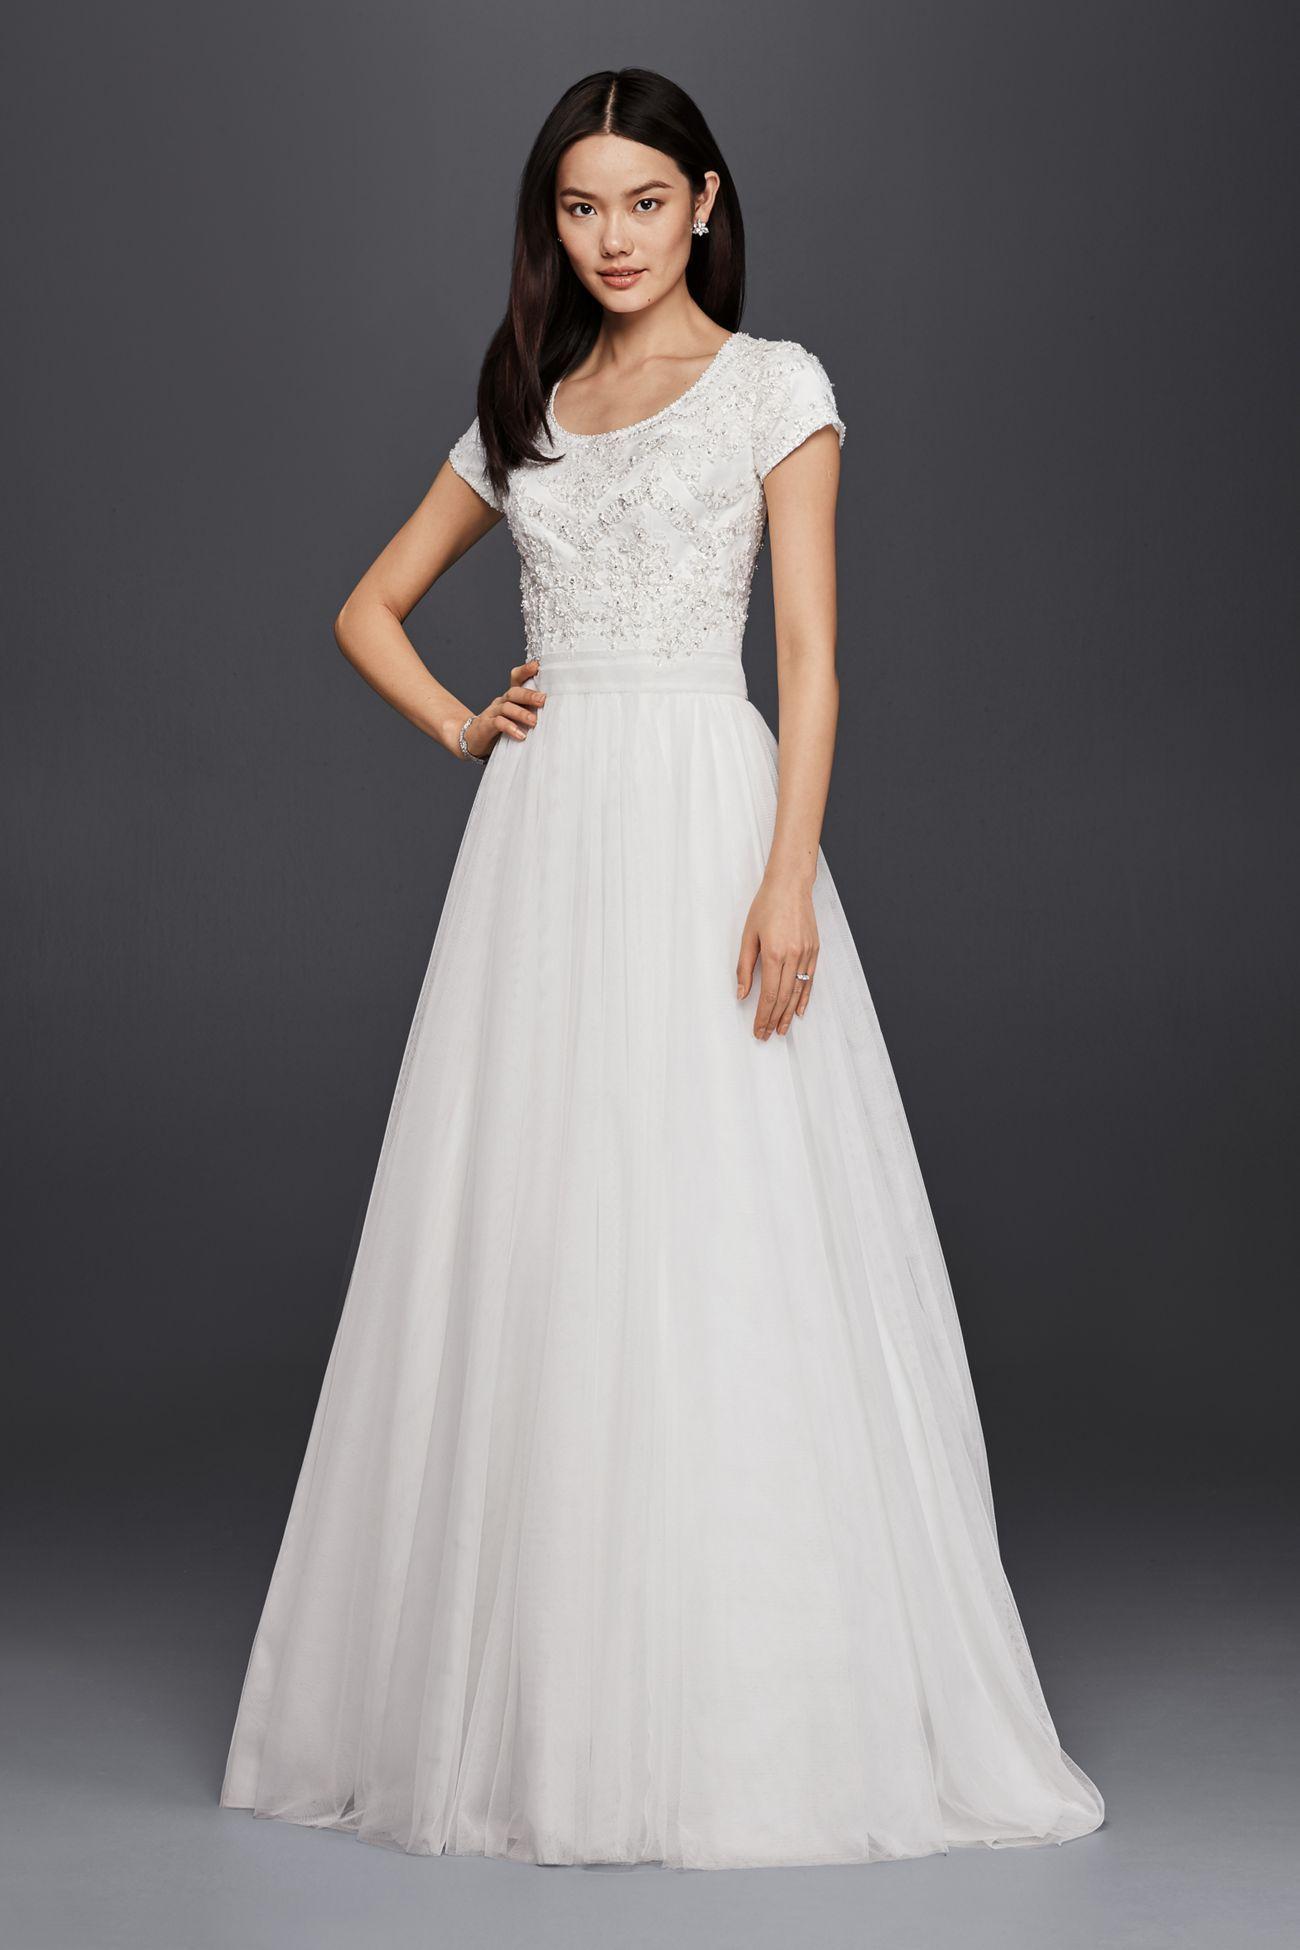 SLWG3811 Short sleeve wedding dress